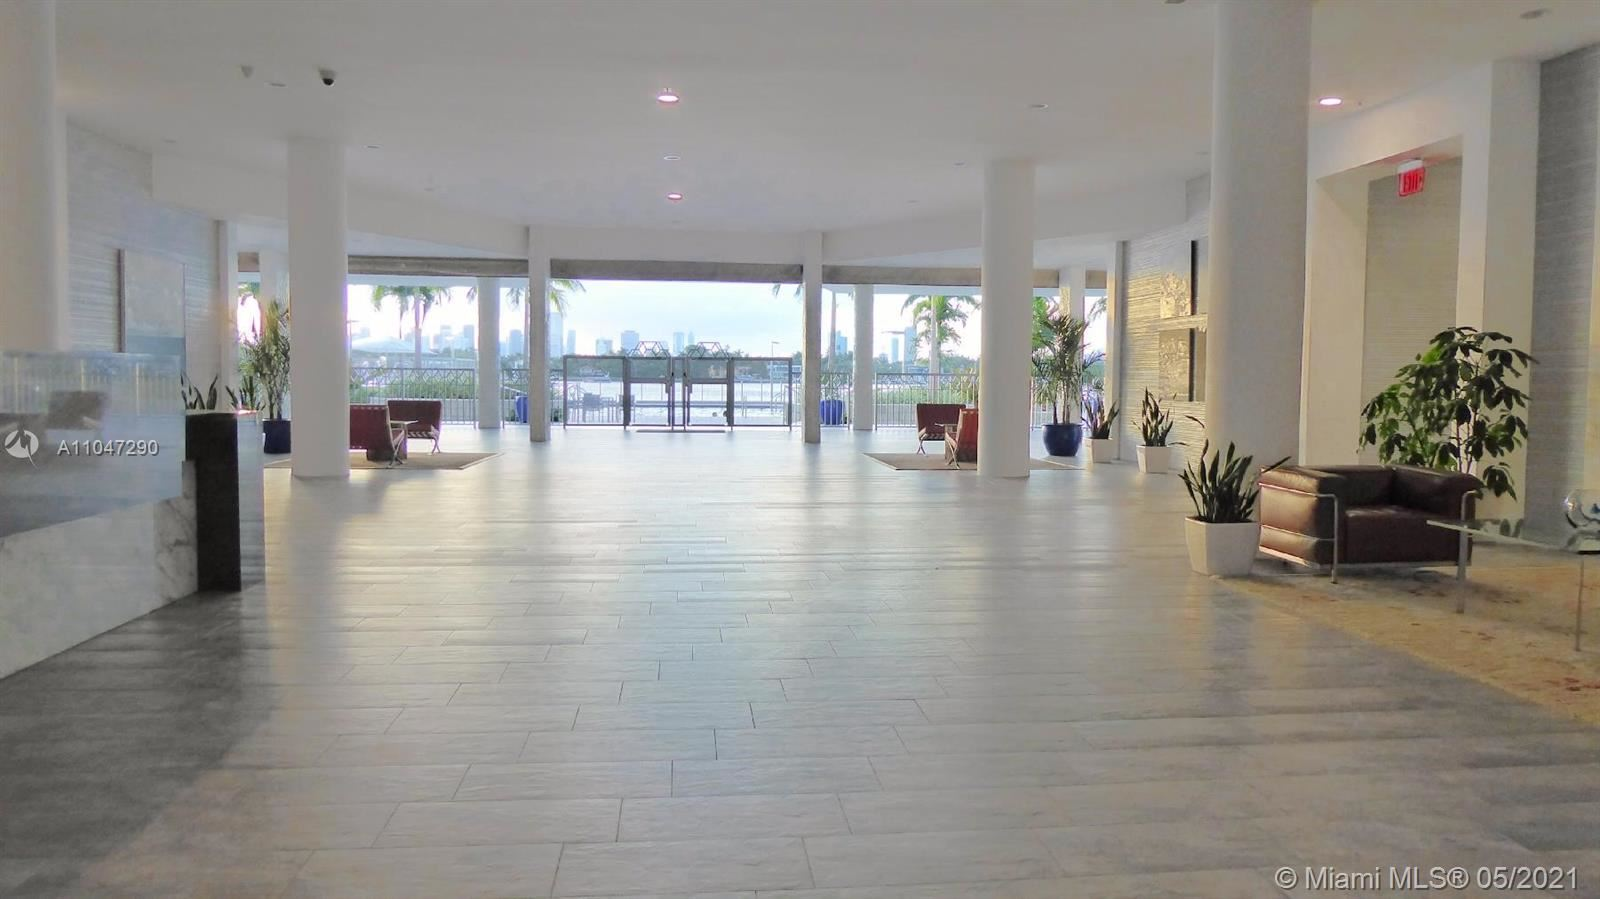 800 West Ave #506, Miami Beach, FL 33139 - #: A11047290